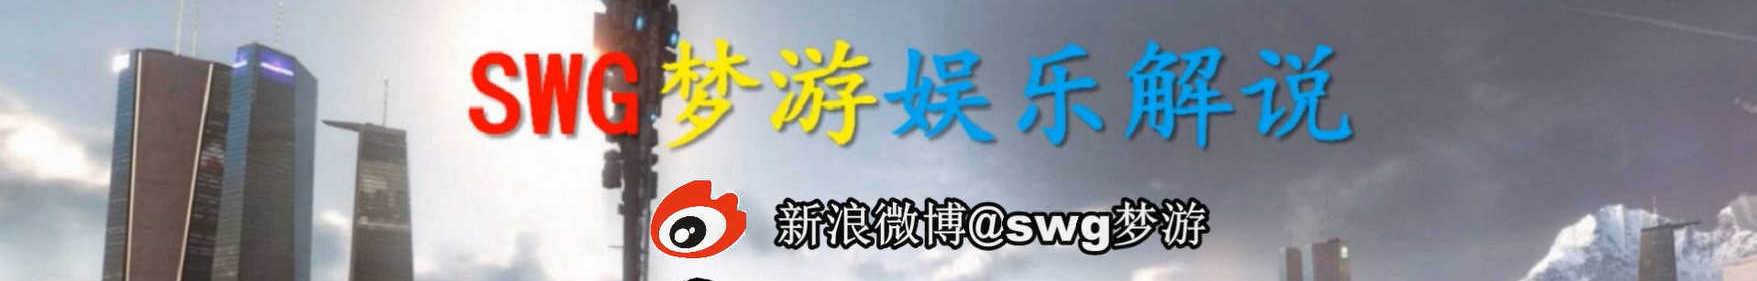 swg梦游 banner